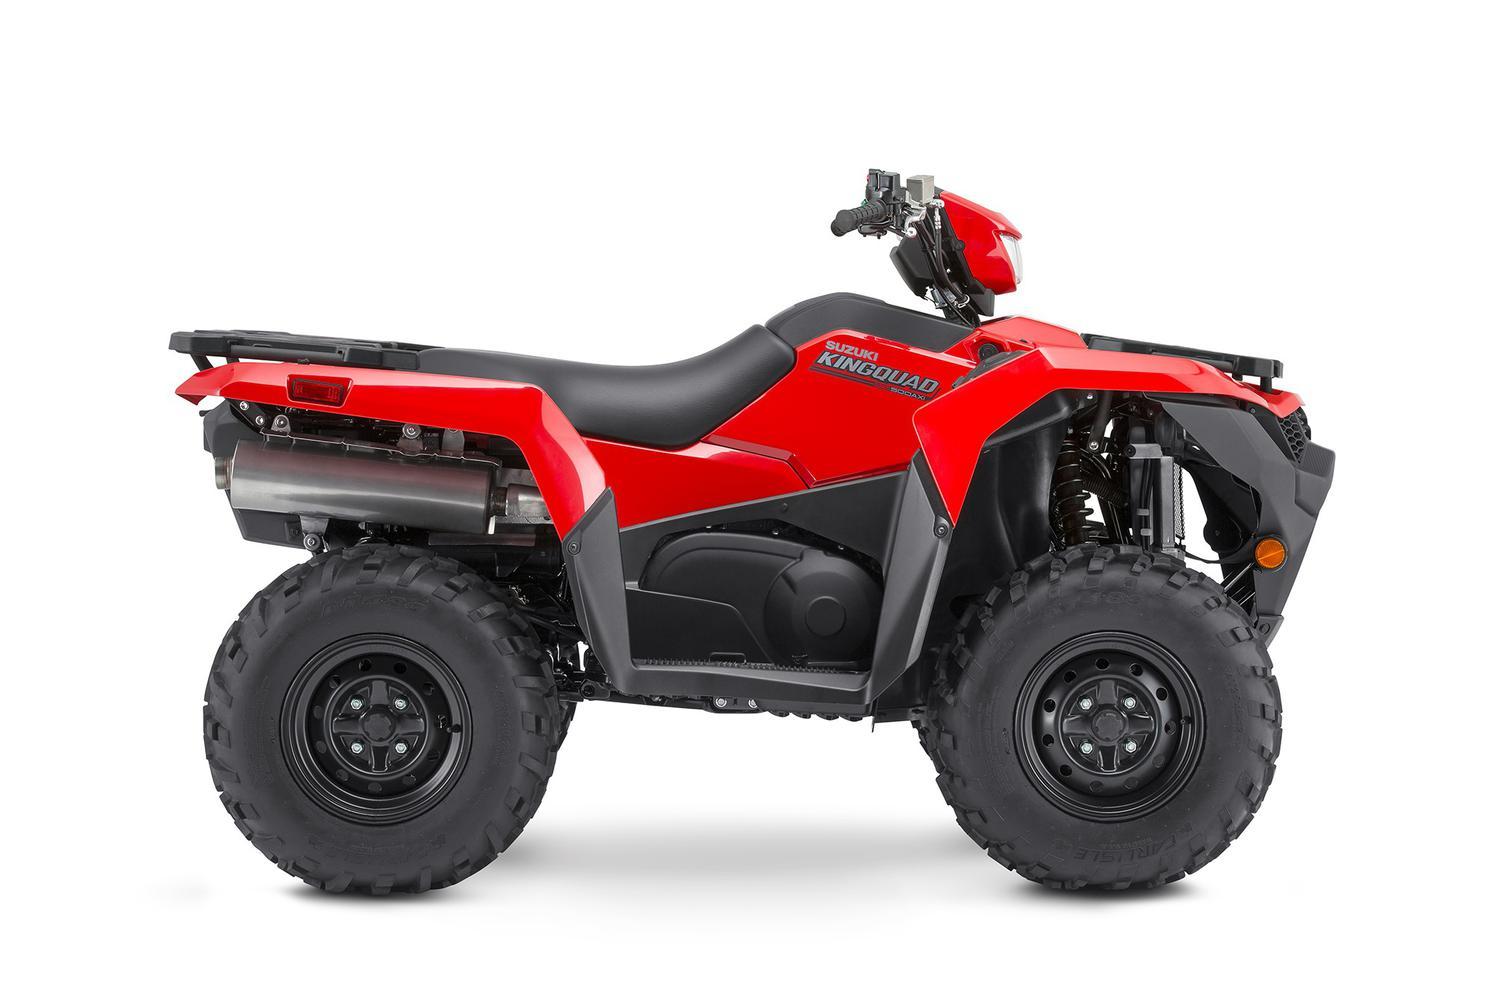 2022 Suzuki KingQuad 500XP - ON ORDER